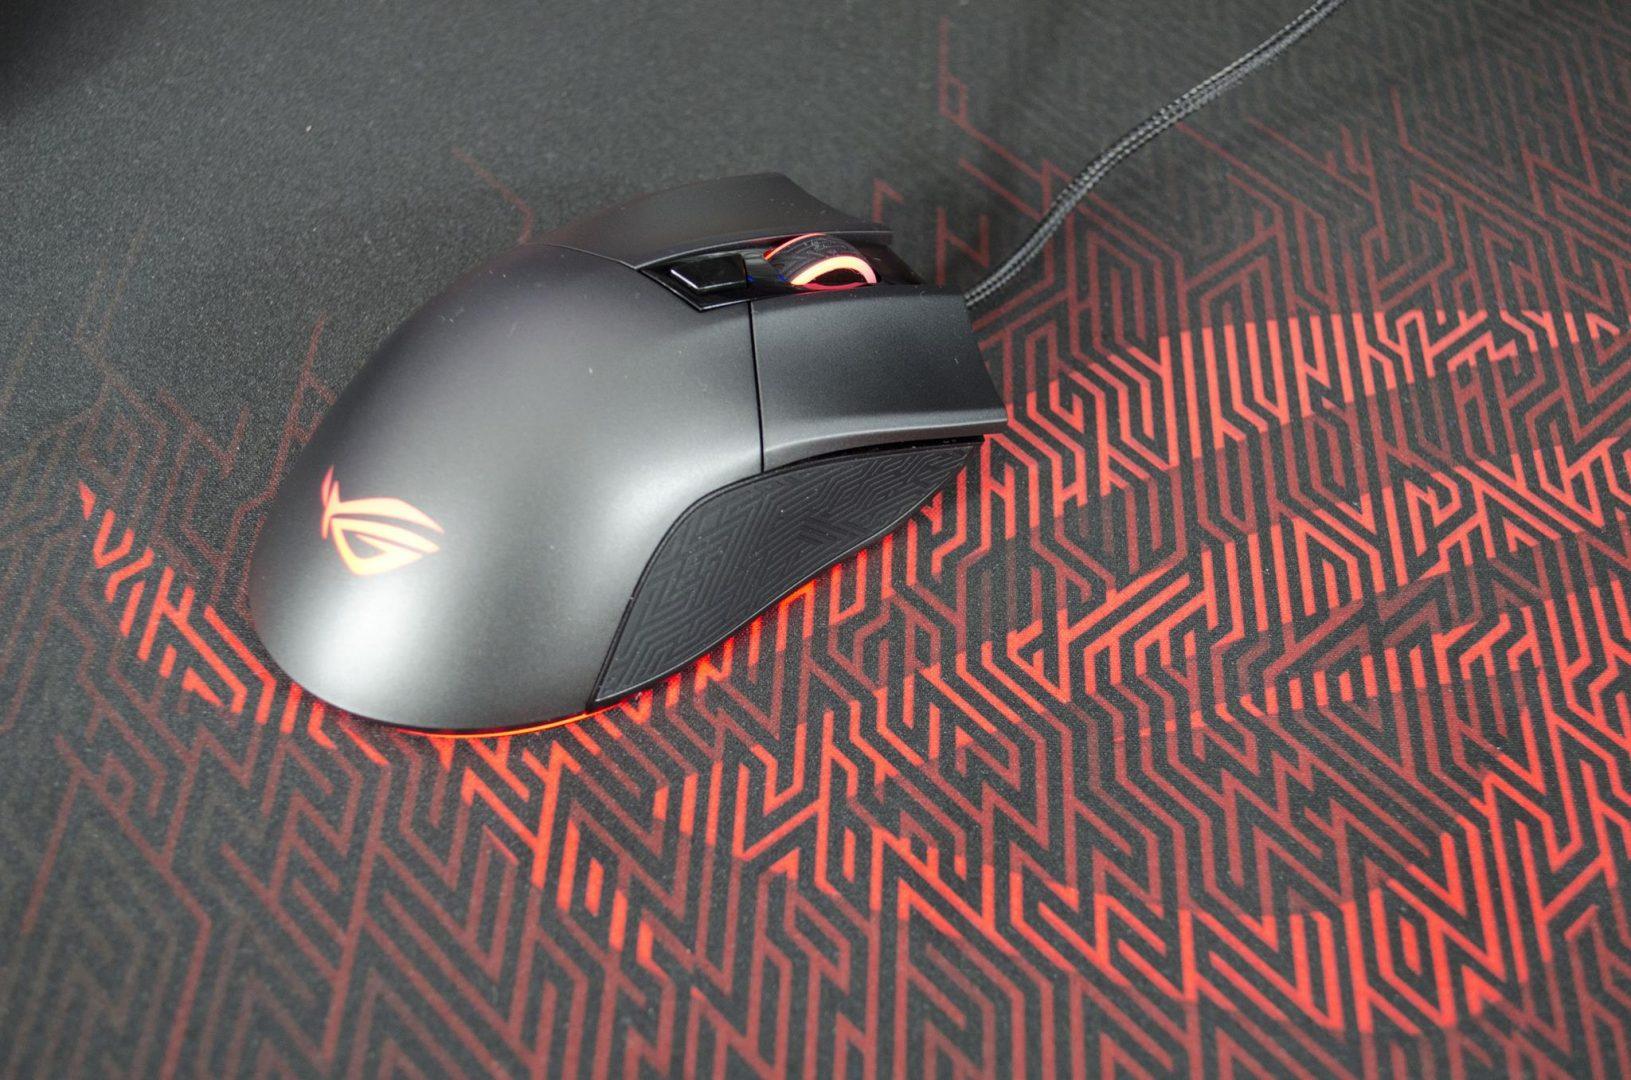 asus rog gladius ii gaming mouse review_1